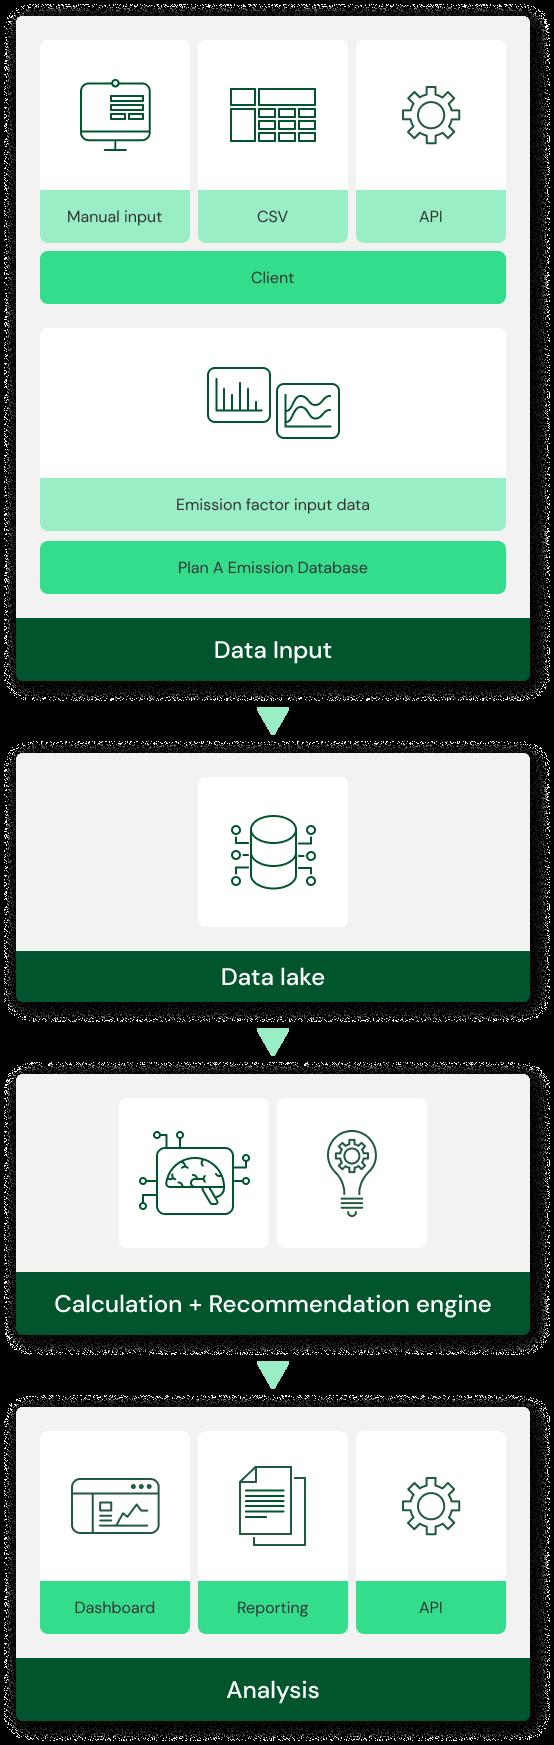 Data process visual